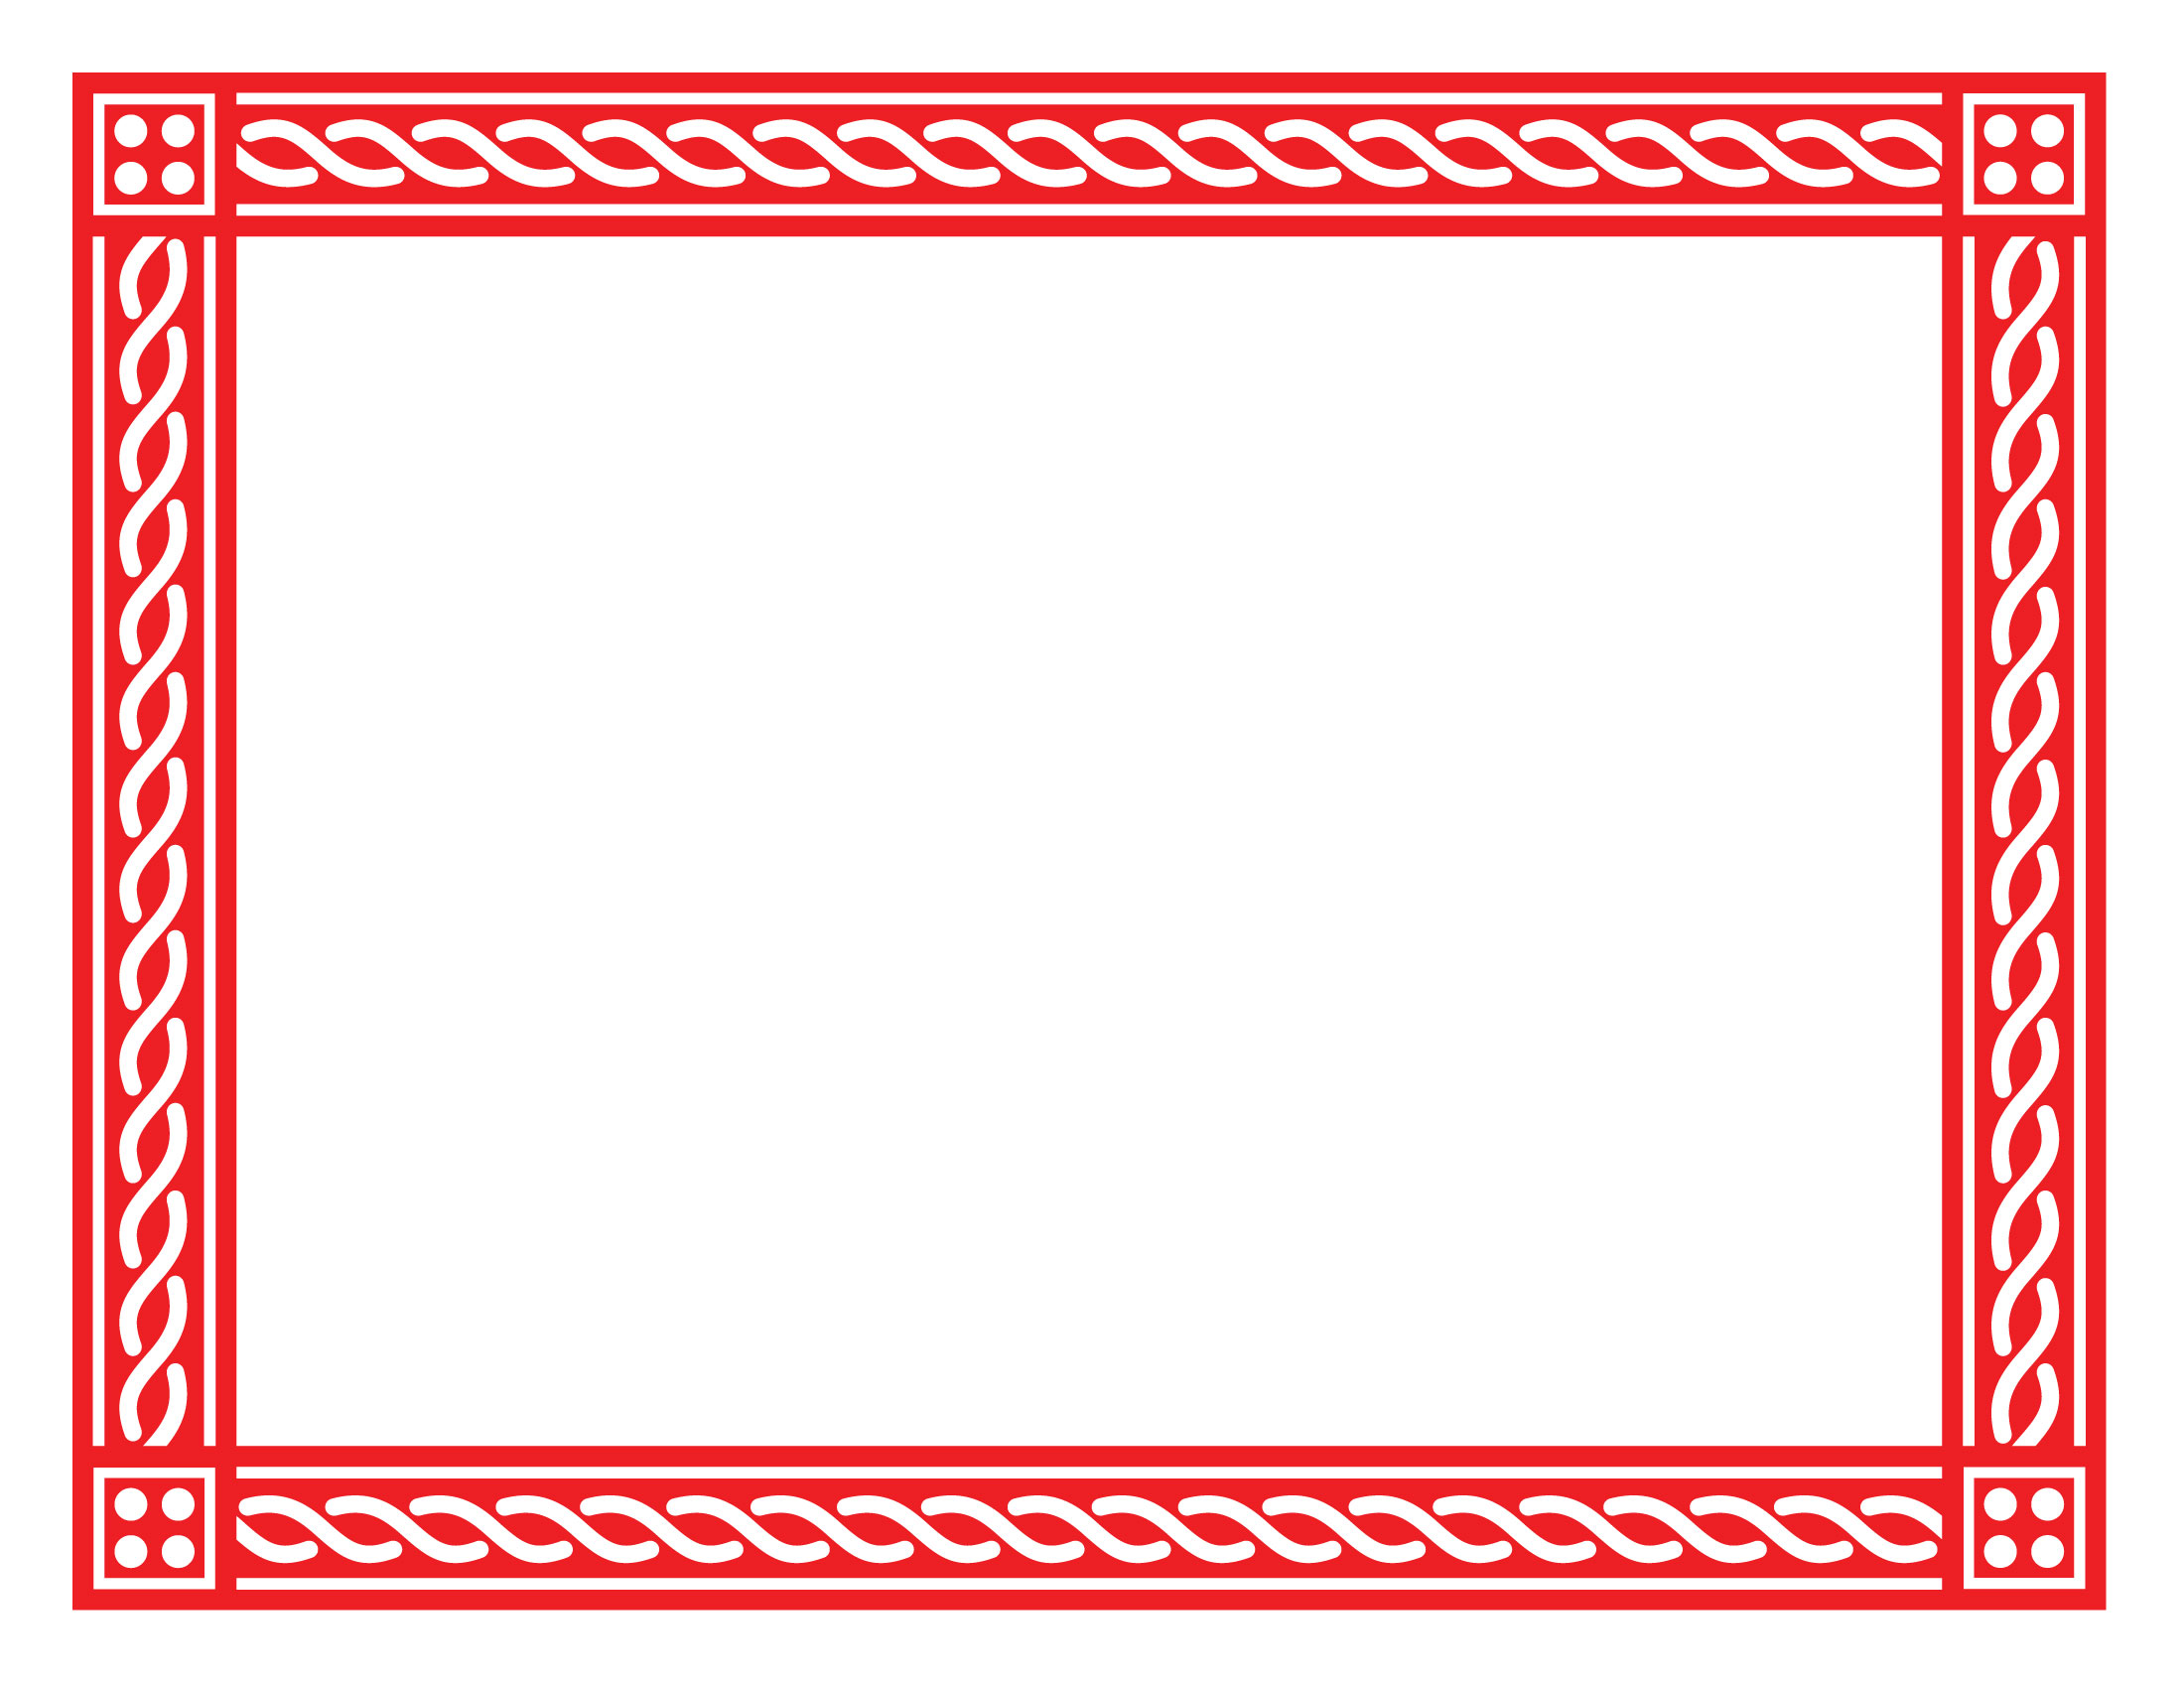 red certificate borders